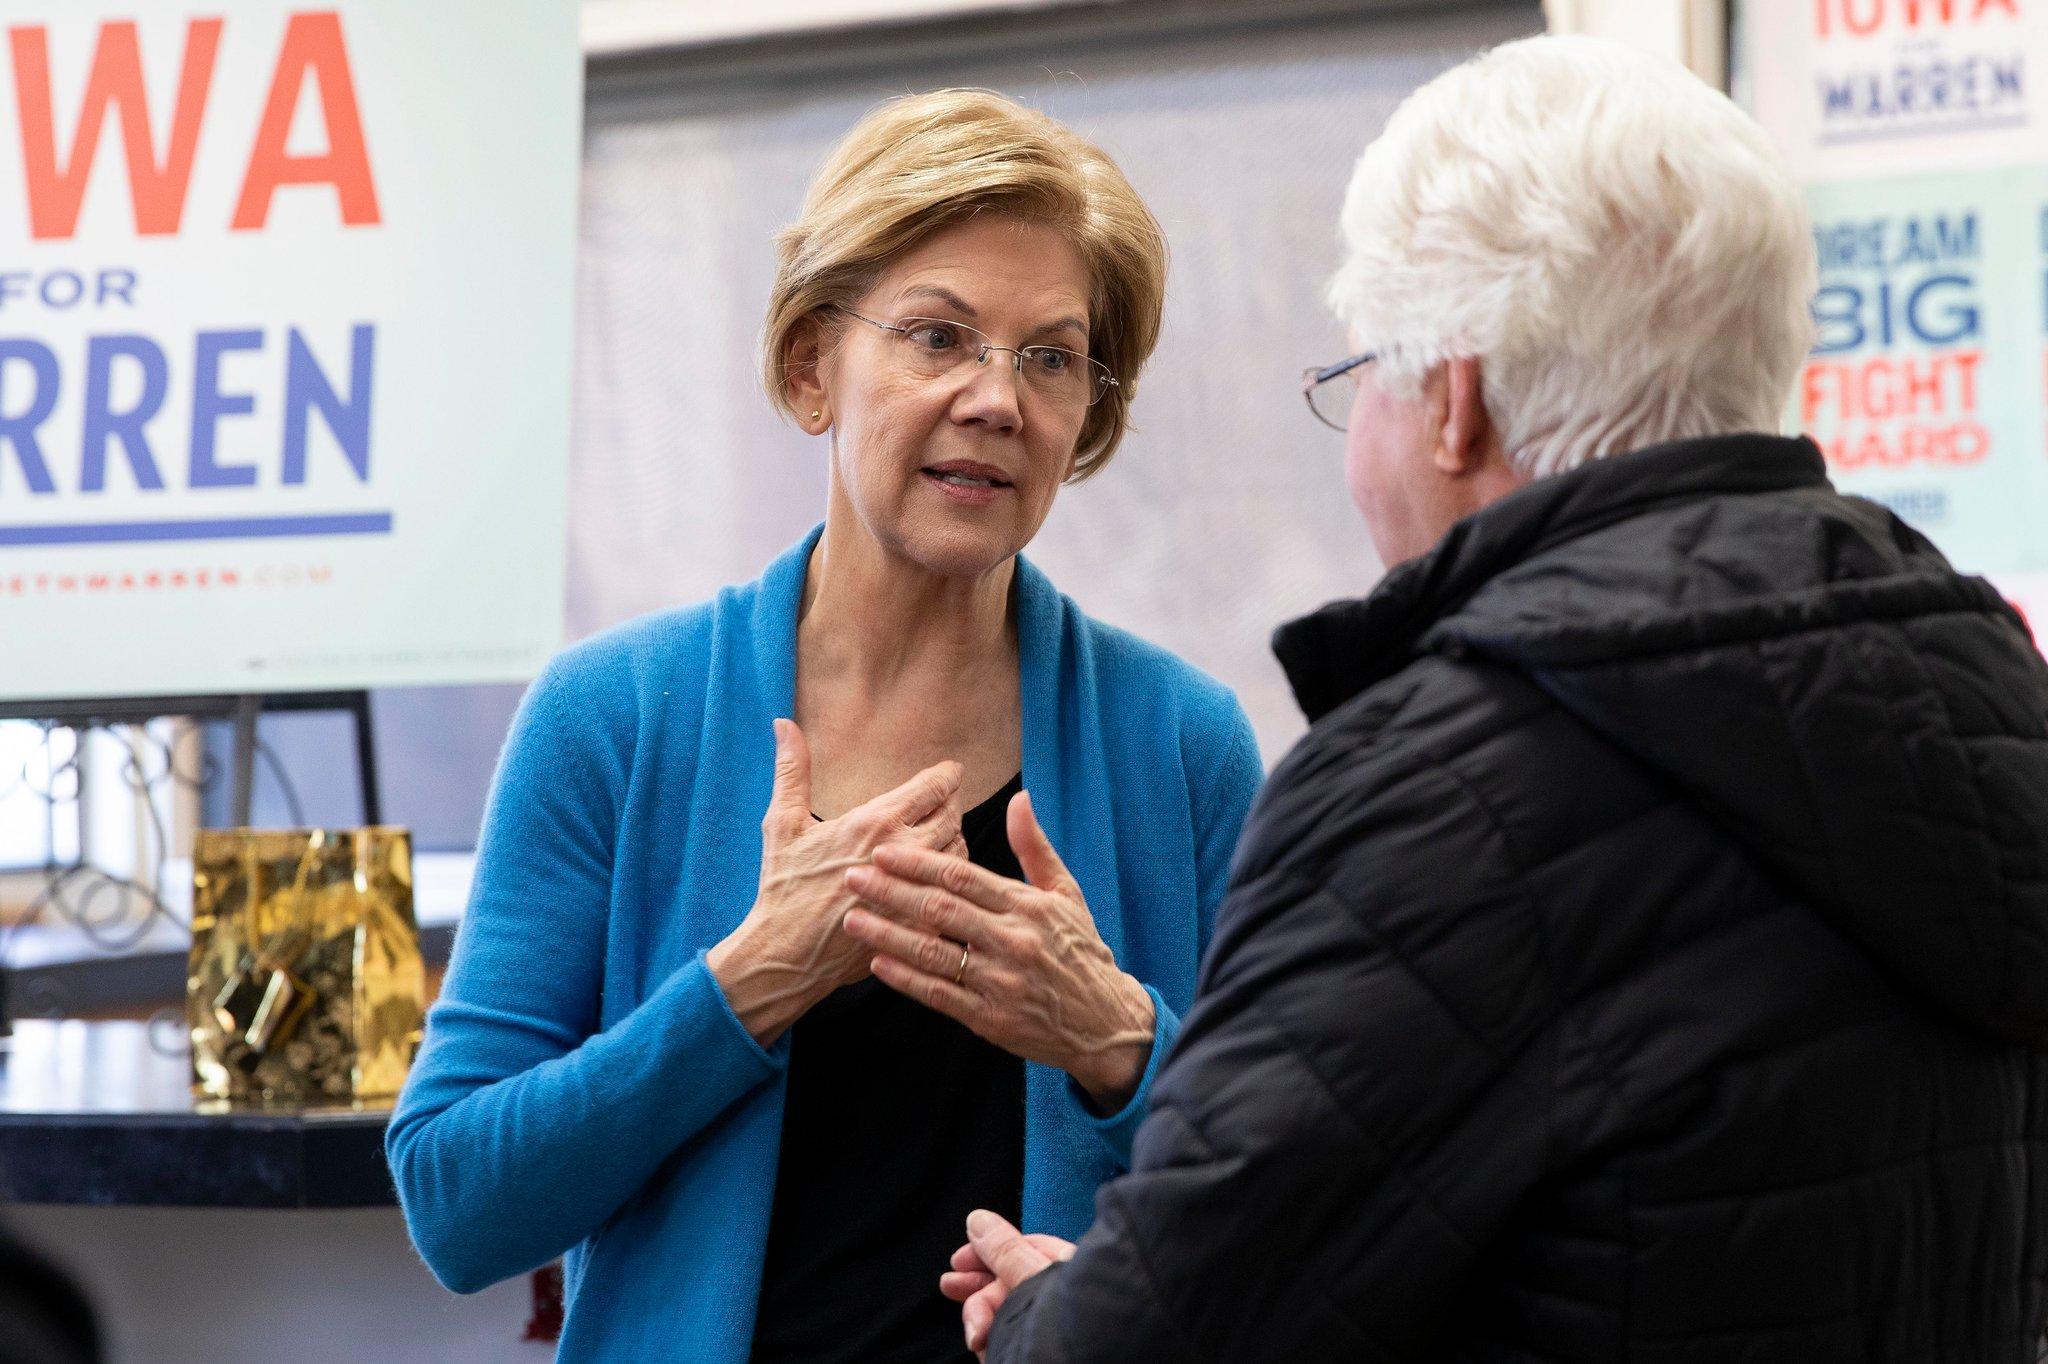 Senator Elizabeth Warren speaks to a potential voter